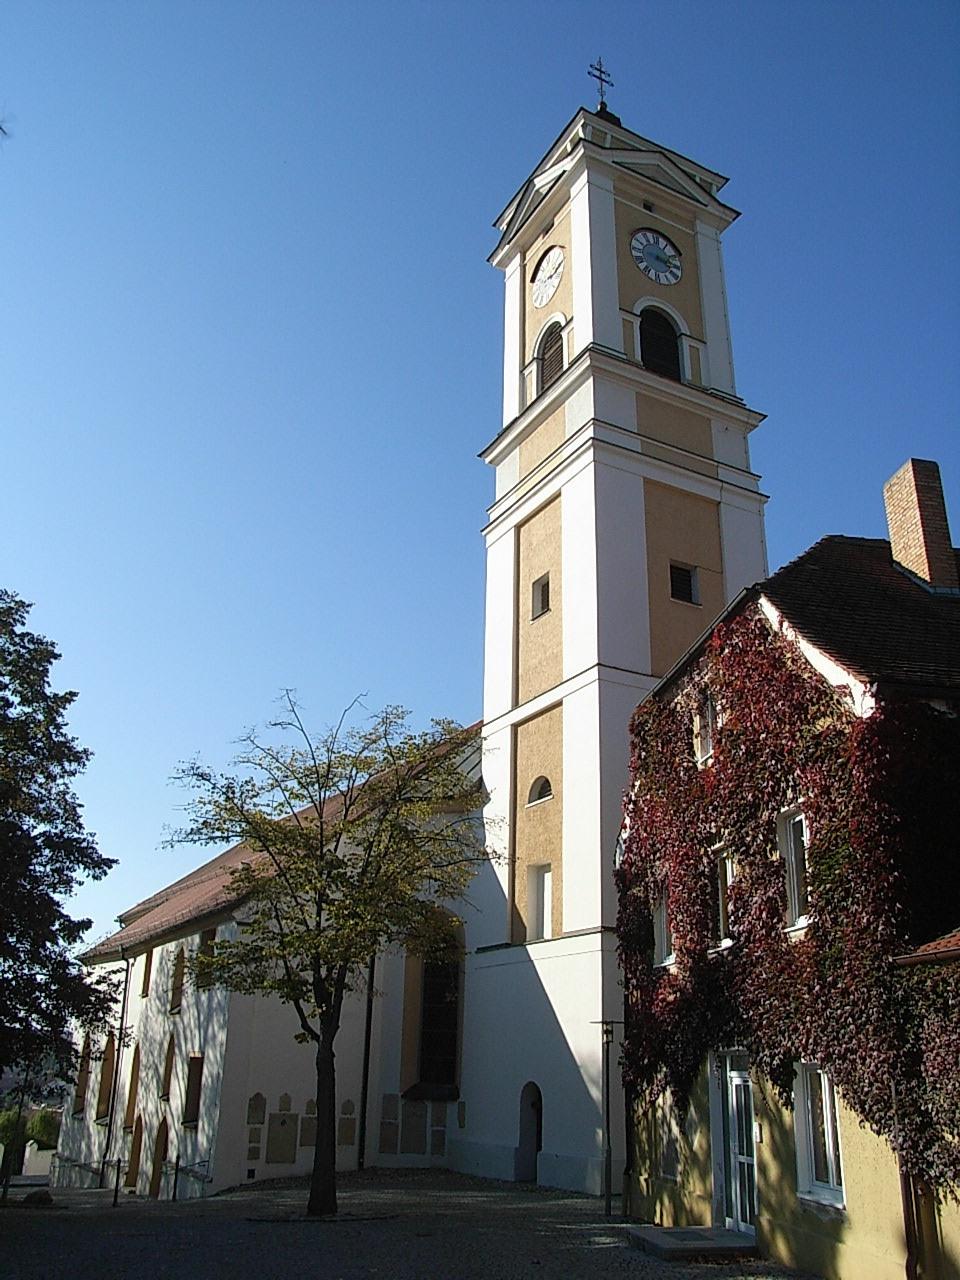 Pfarrkirche Bad Birnbach